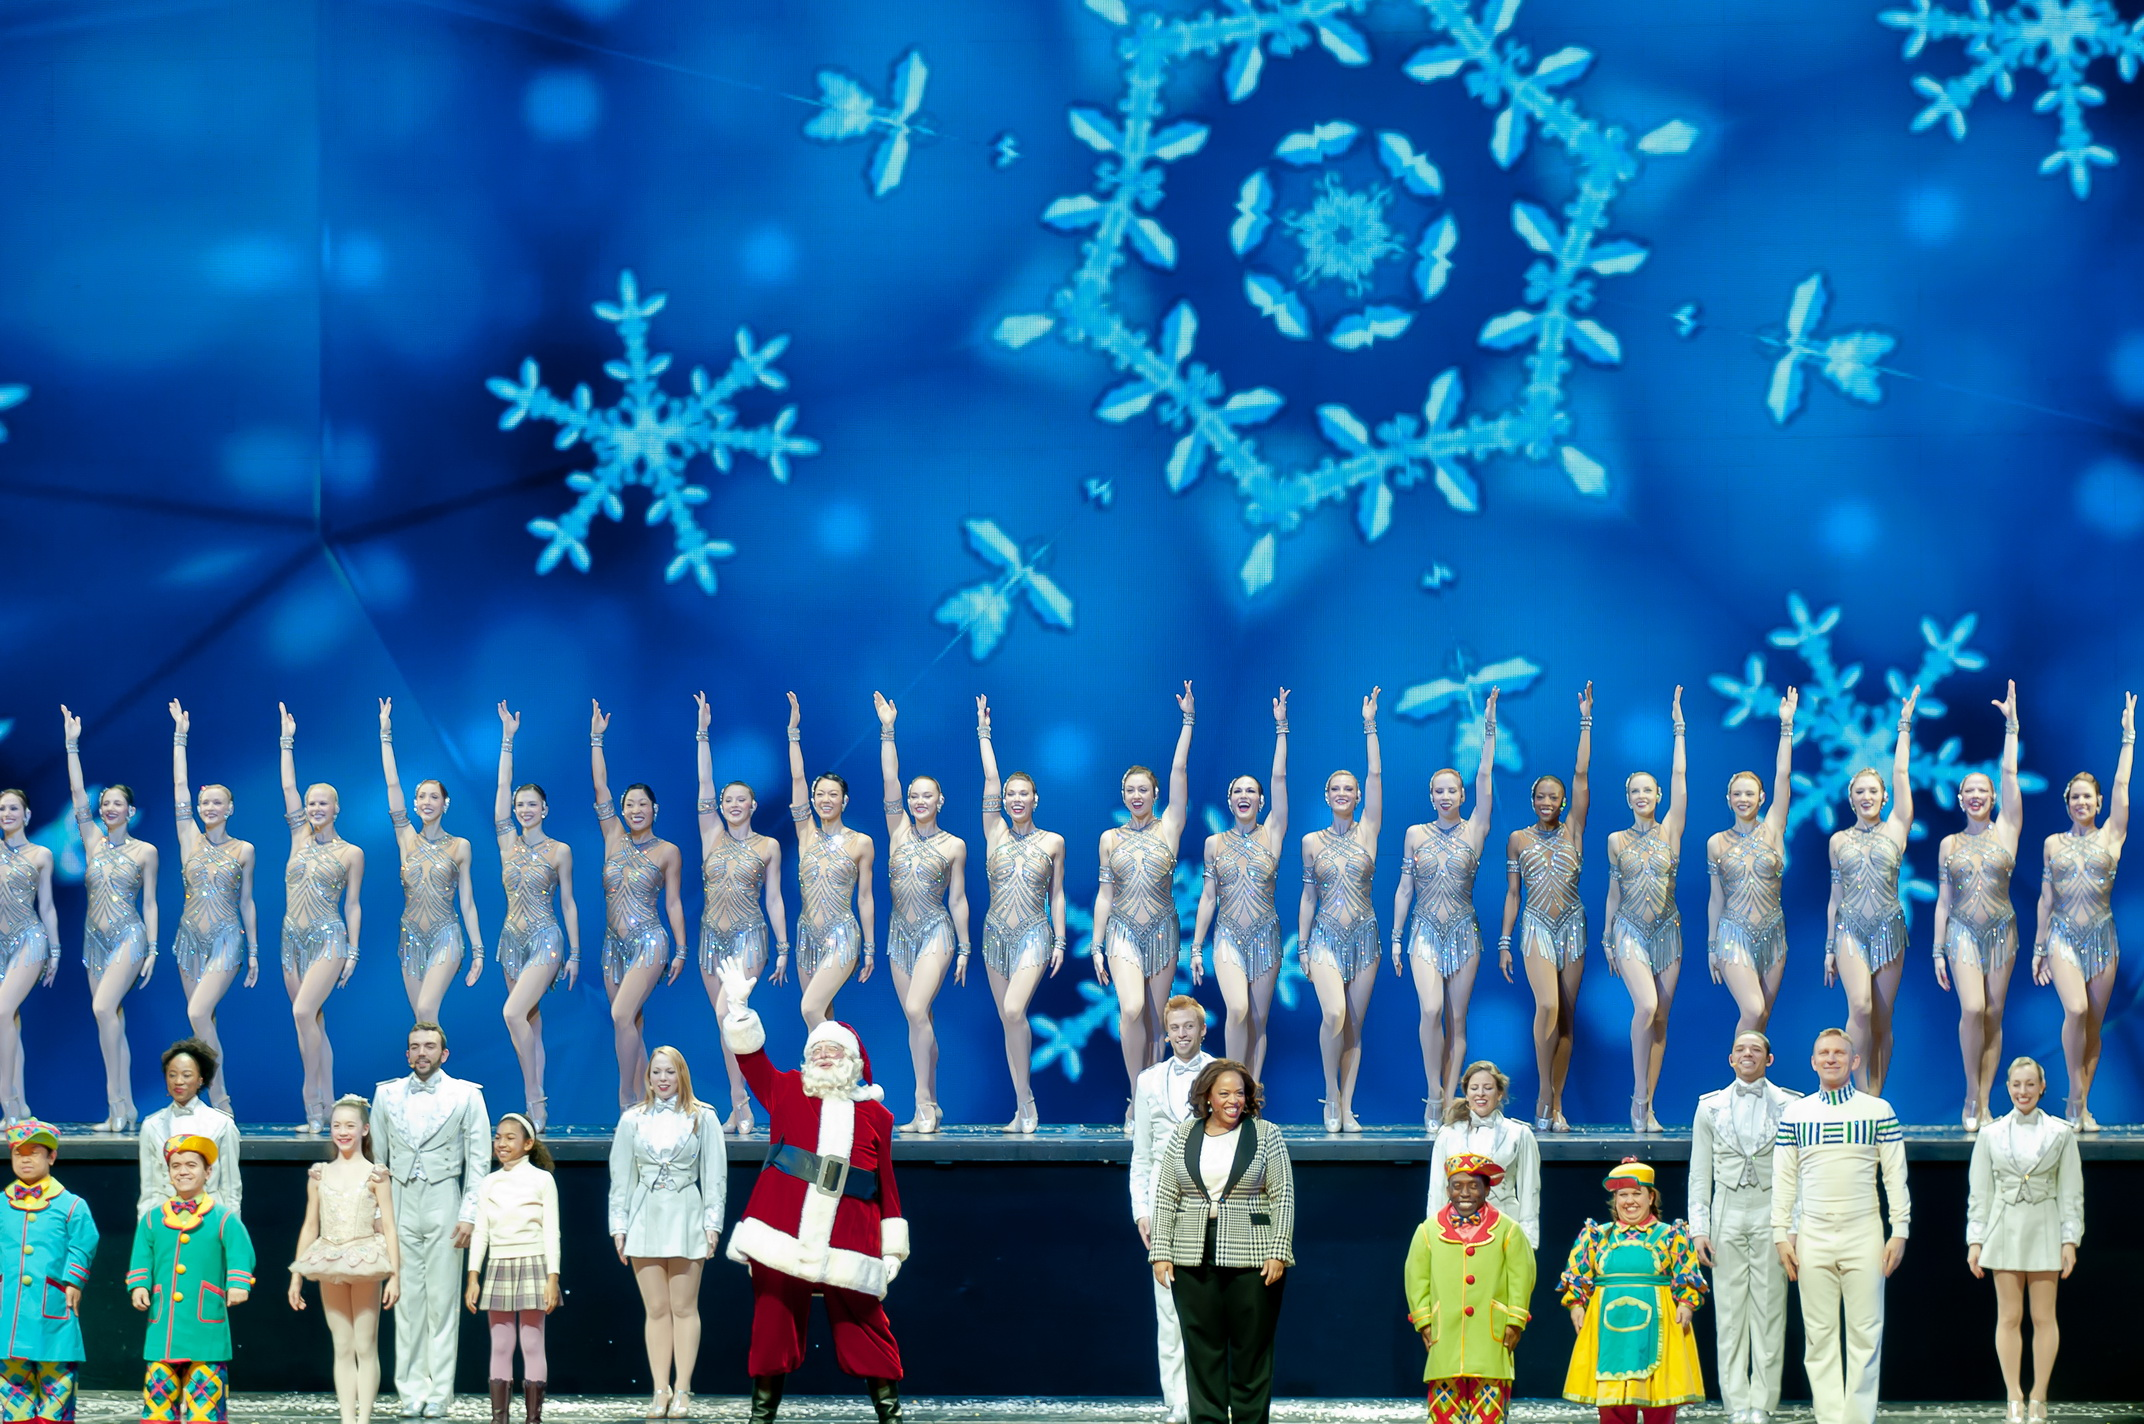 4100_Radio City Music Hall Rockettes show